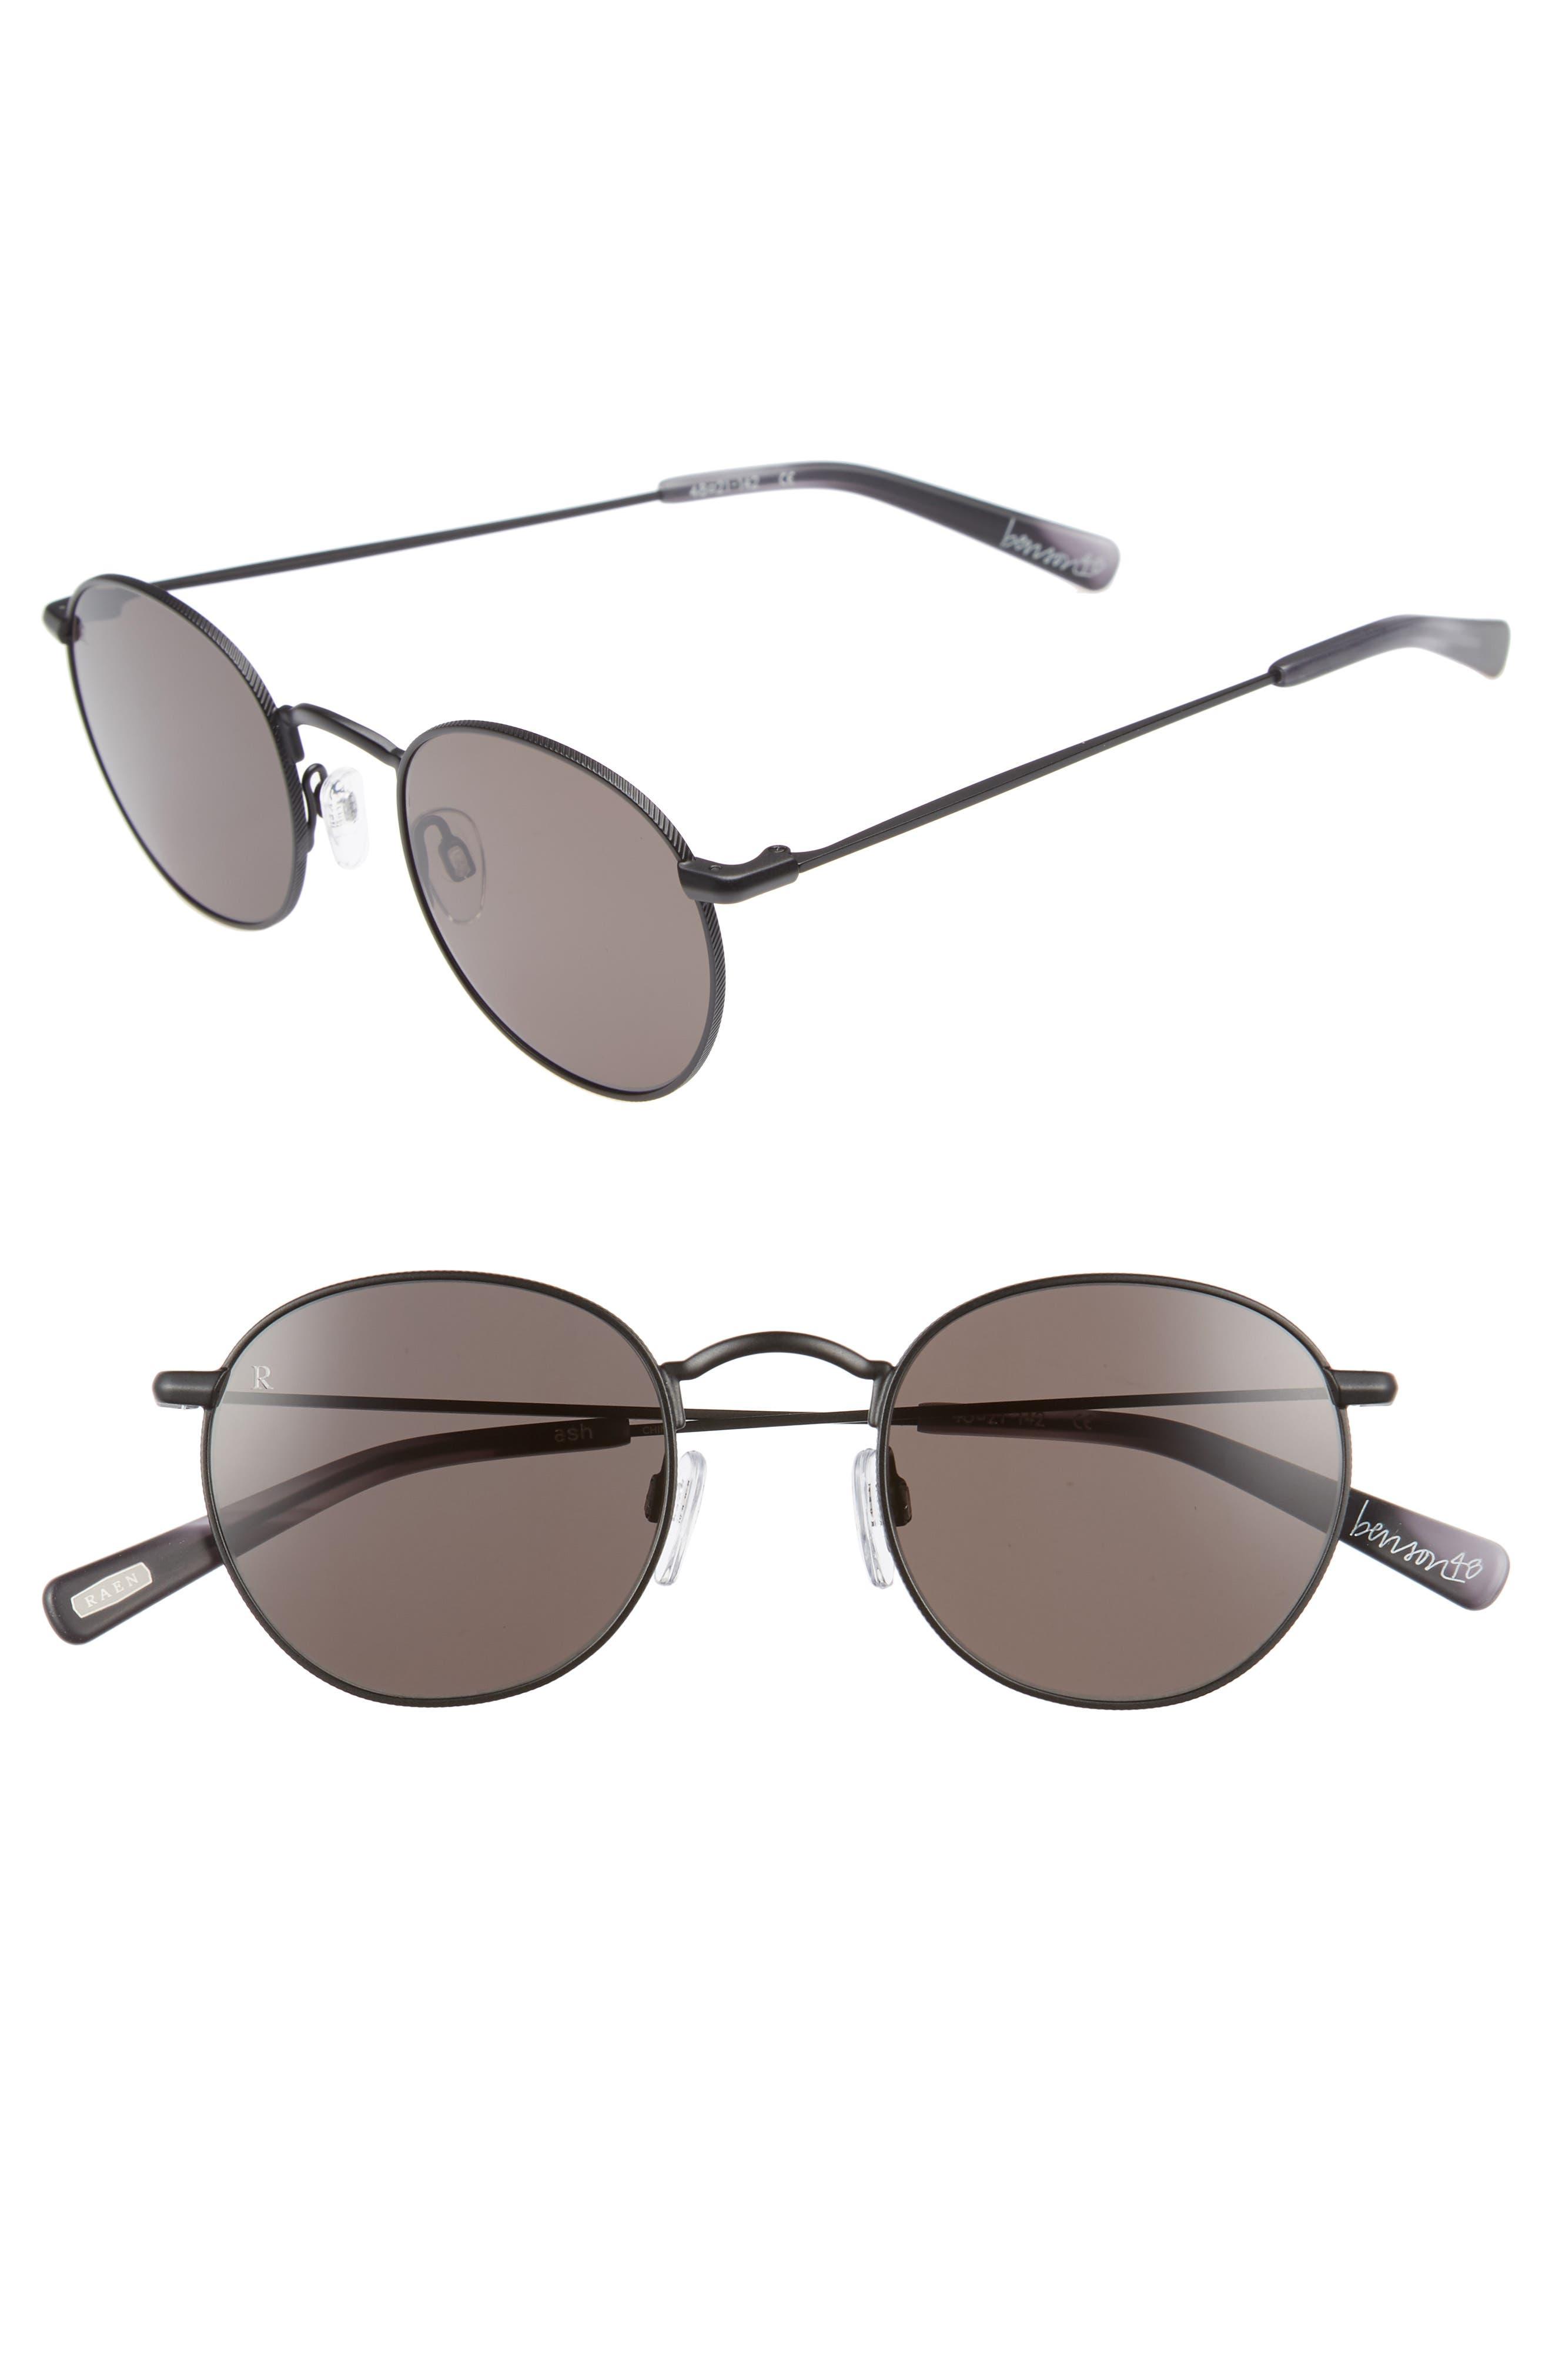 Benson 48mm Sunglasses,                             Main thumbnail 1, color,                             Ash